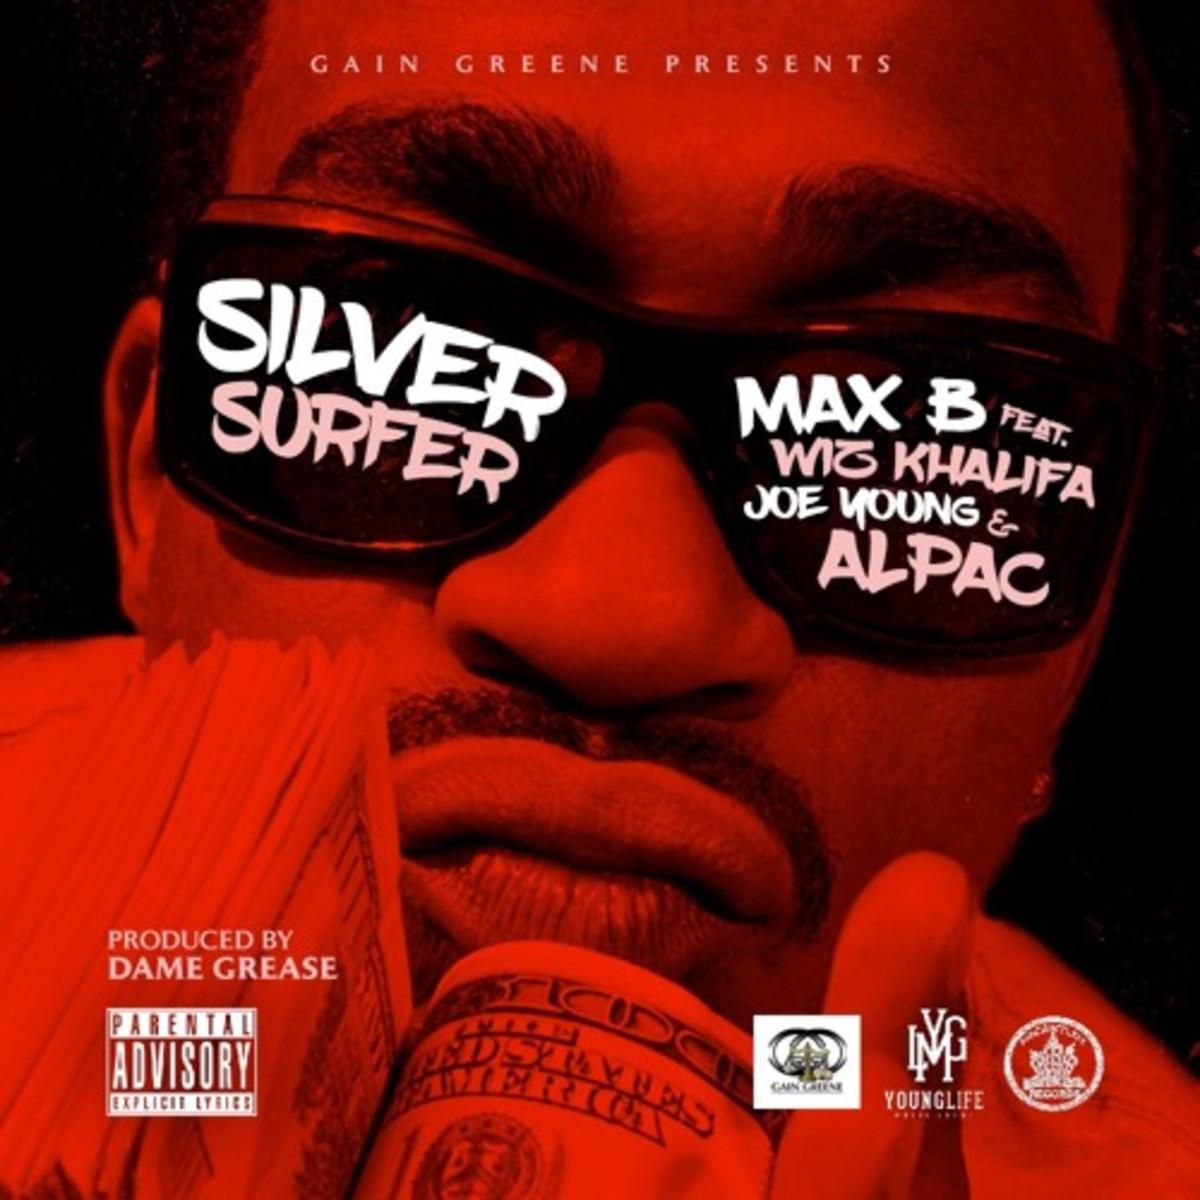 max-b-silver-surfer.jpg